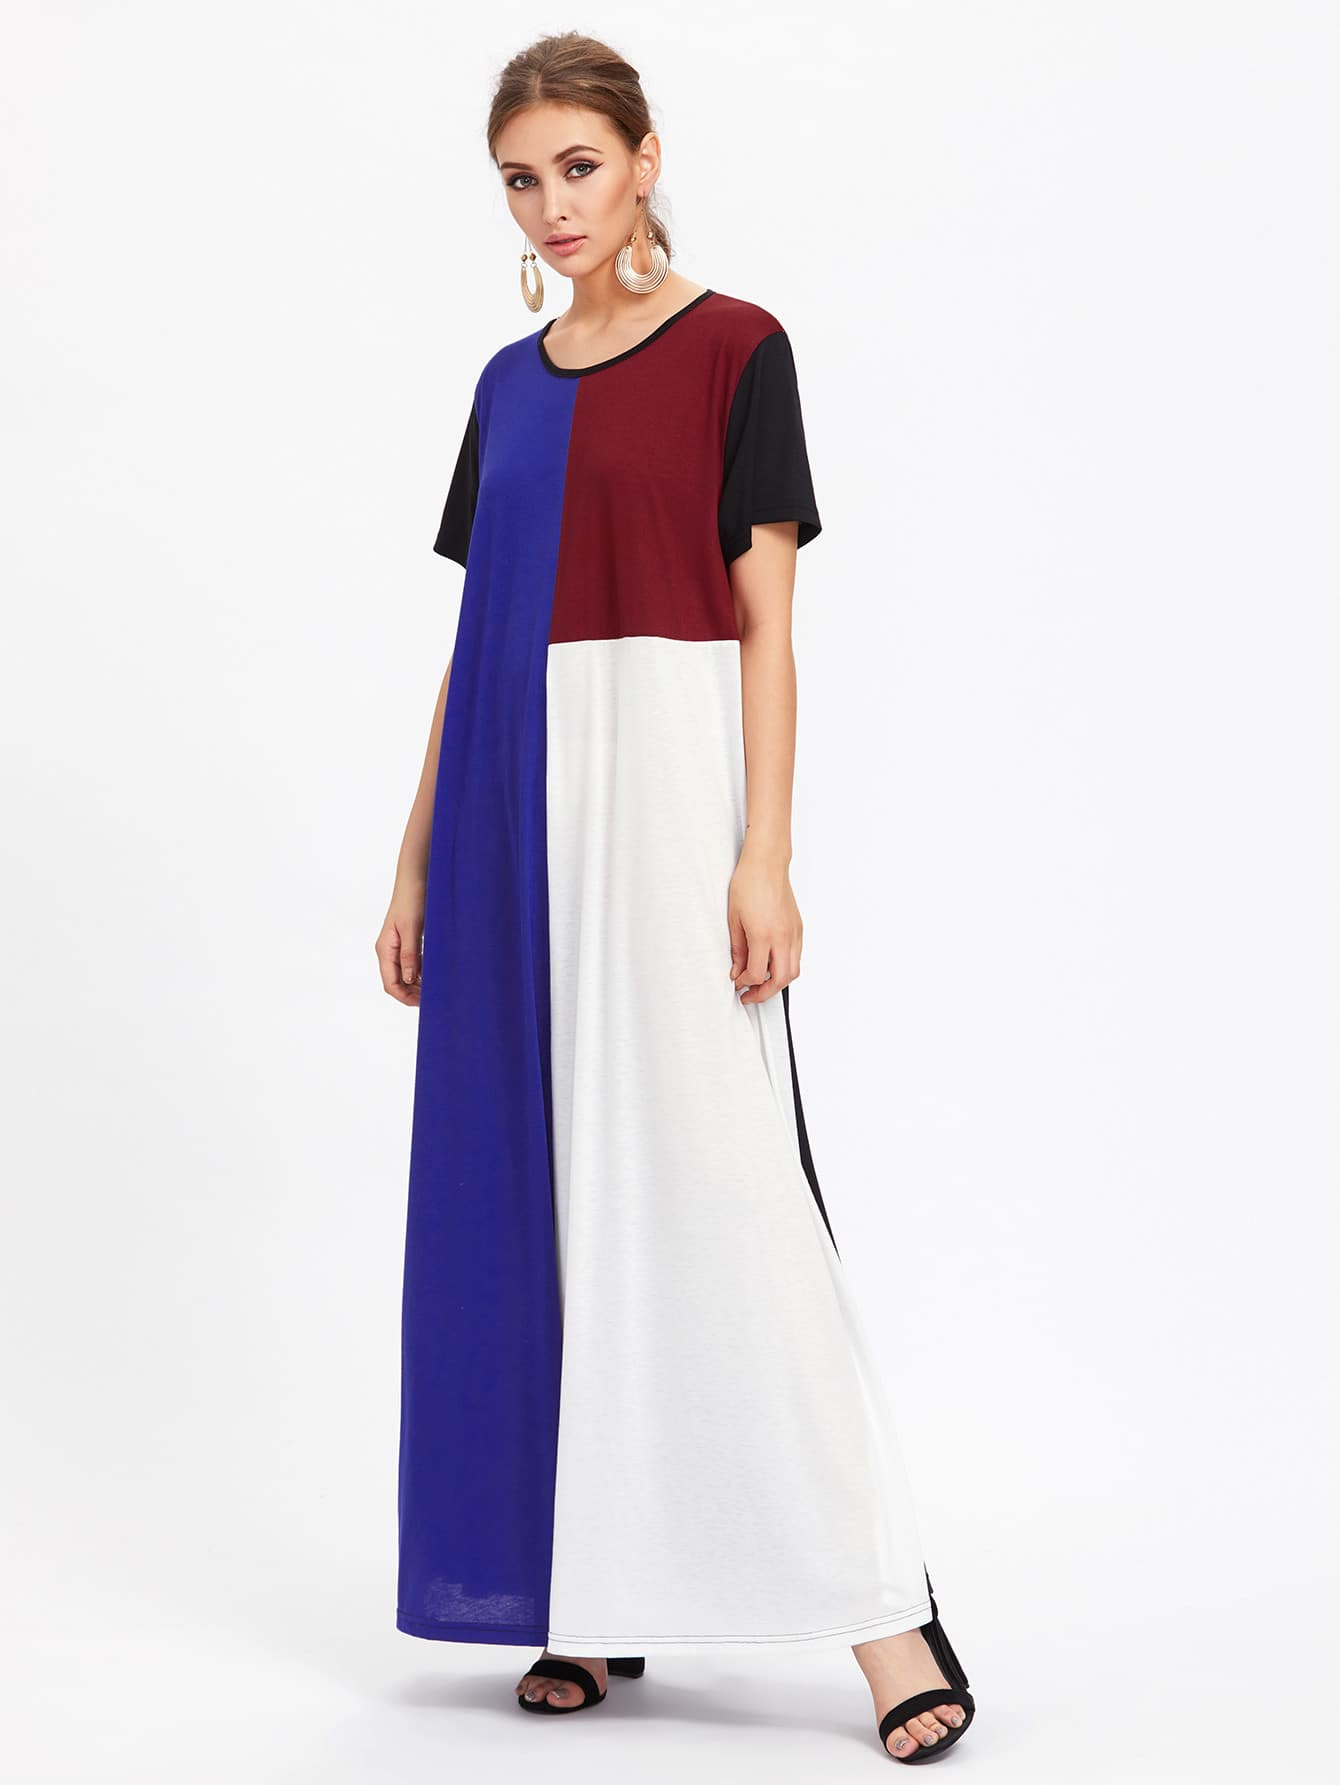 Color Block Full Length Tee Dress pocket full length tee dress